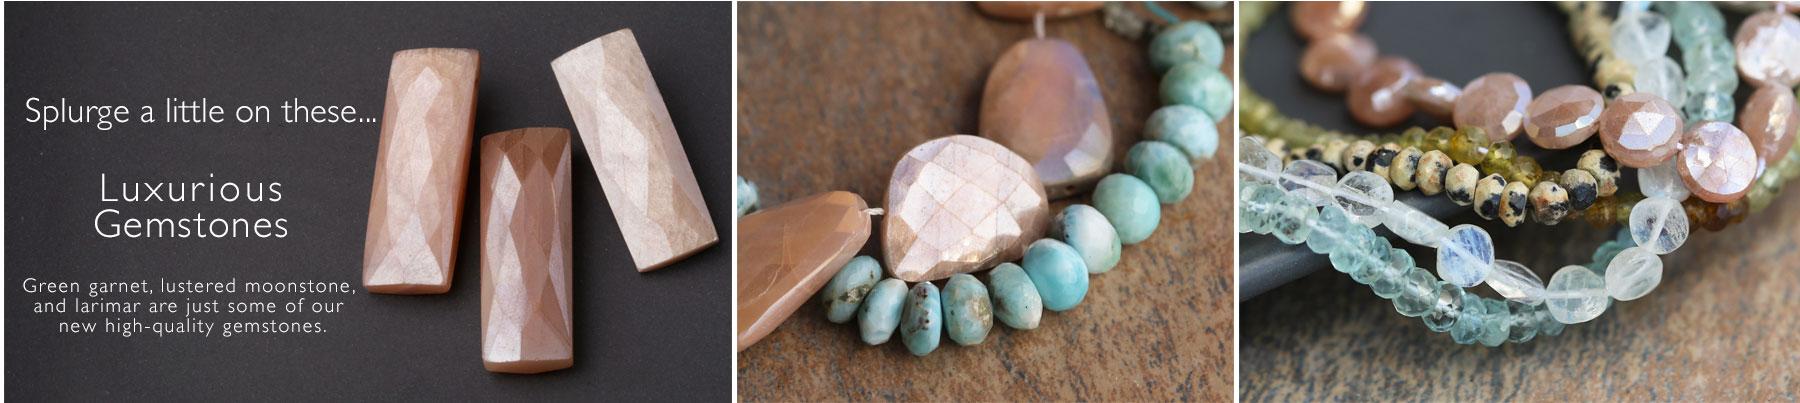 buy popular 9d9f6 8d6ab Lima Beads has Gemstone Beads, Metal, Czech Glass, CZ, Findings ...